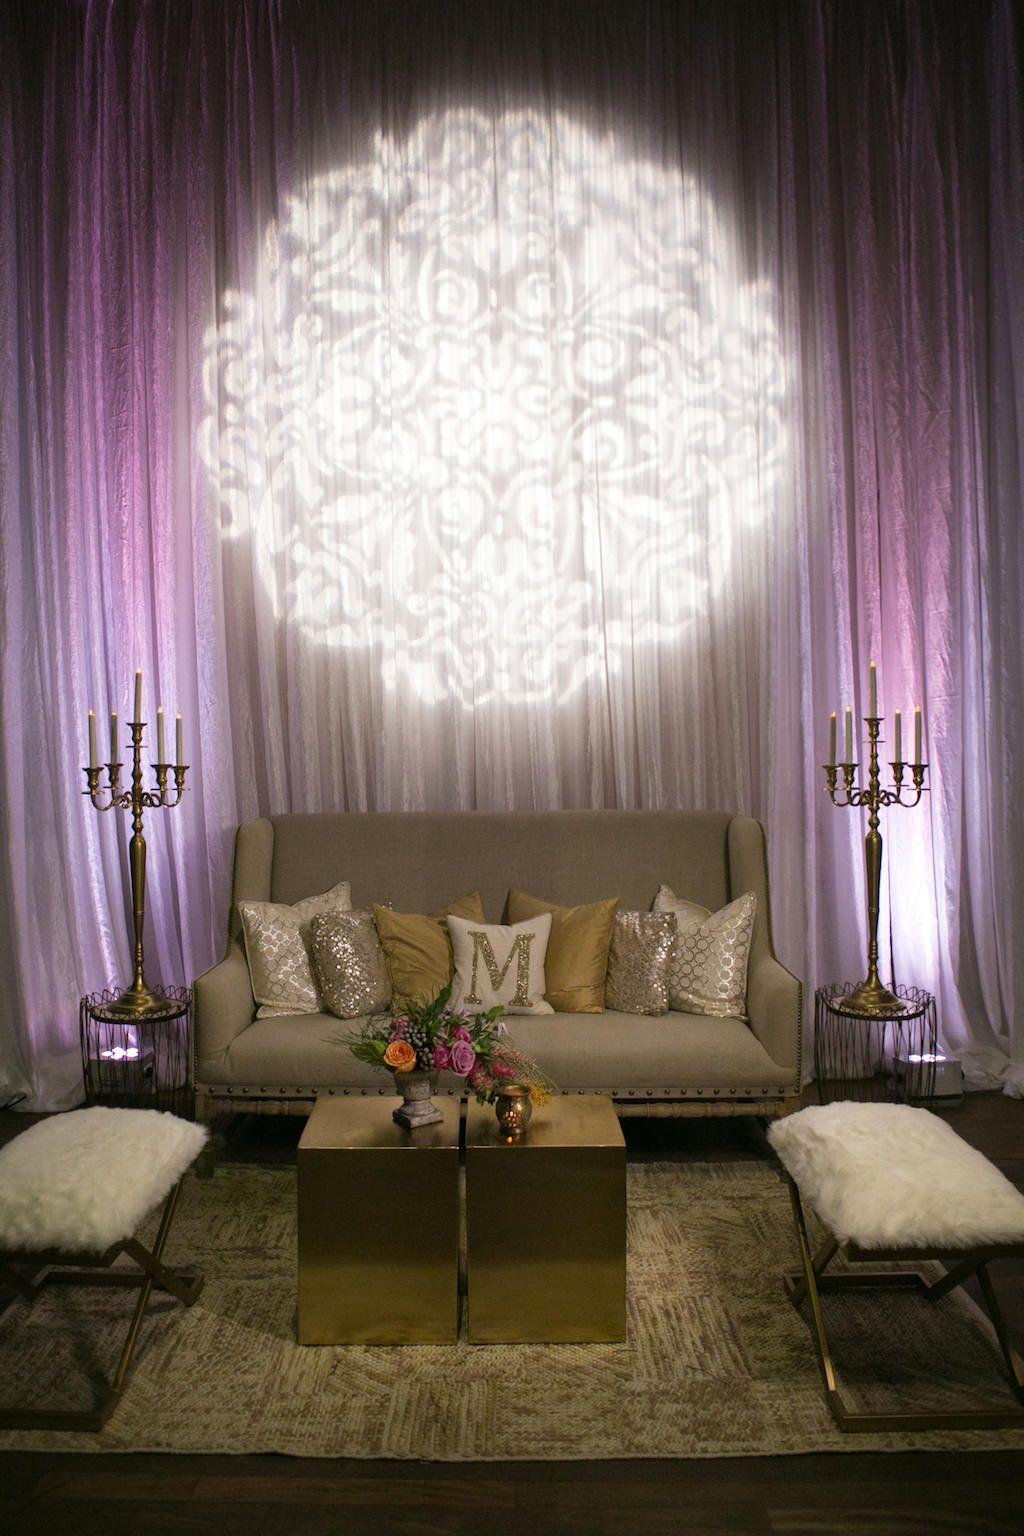 Stylish Wedding Lounge Decor with Modern Furnishings, Tropical Florals, and Purple Uplighting | Luxurious St. Pete Wedding Venue NOVA 535